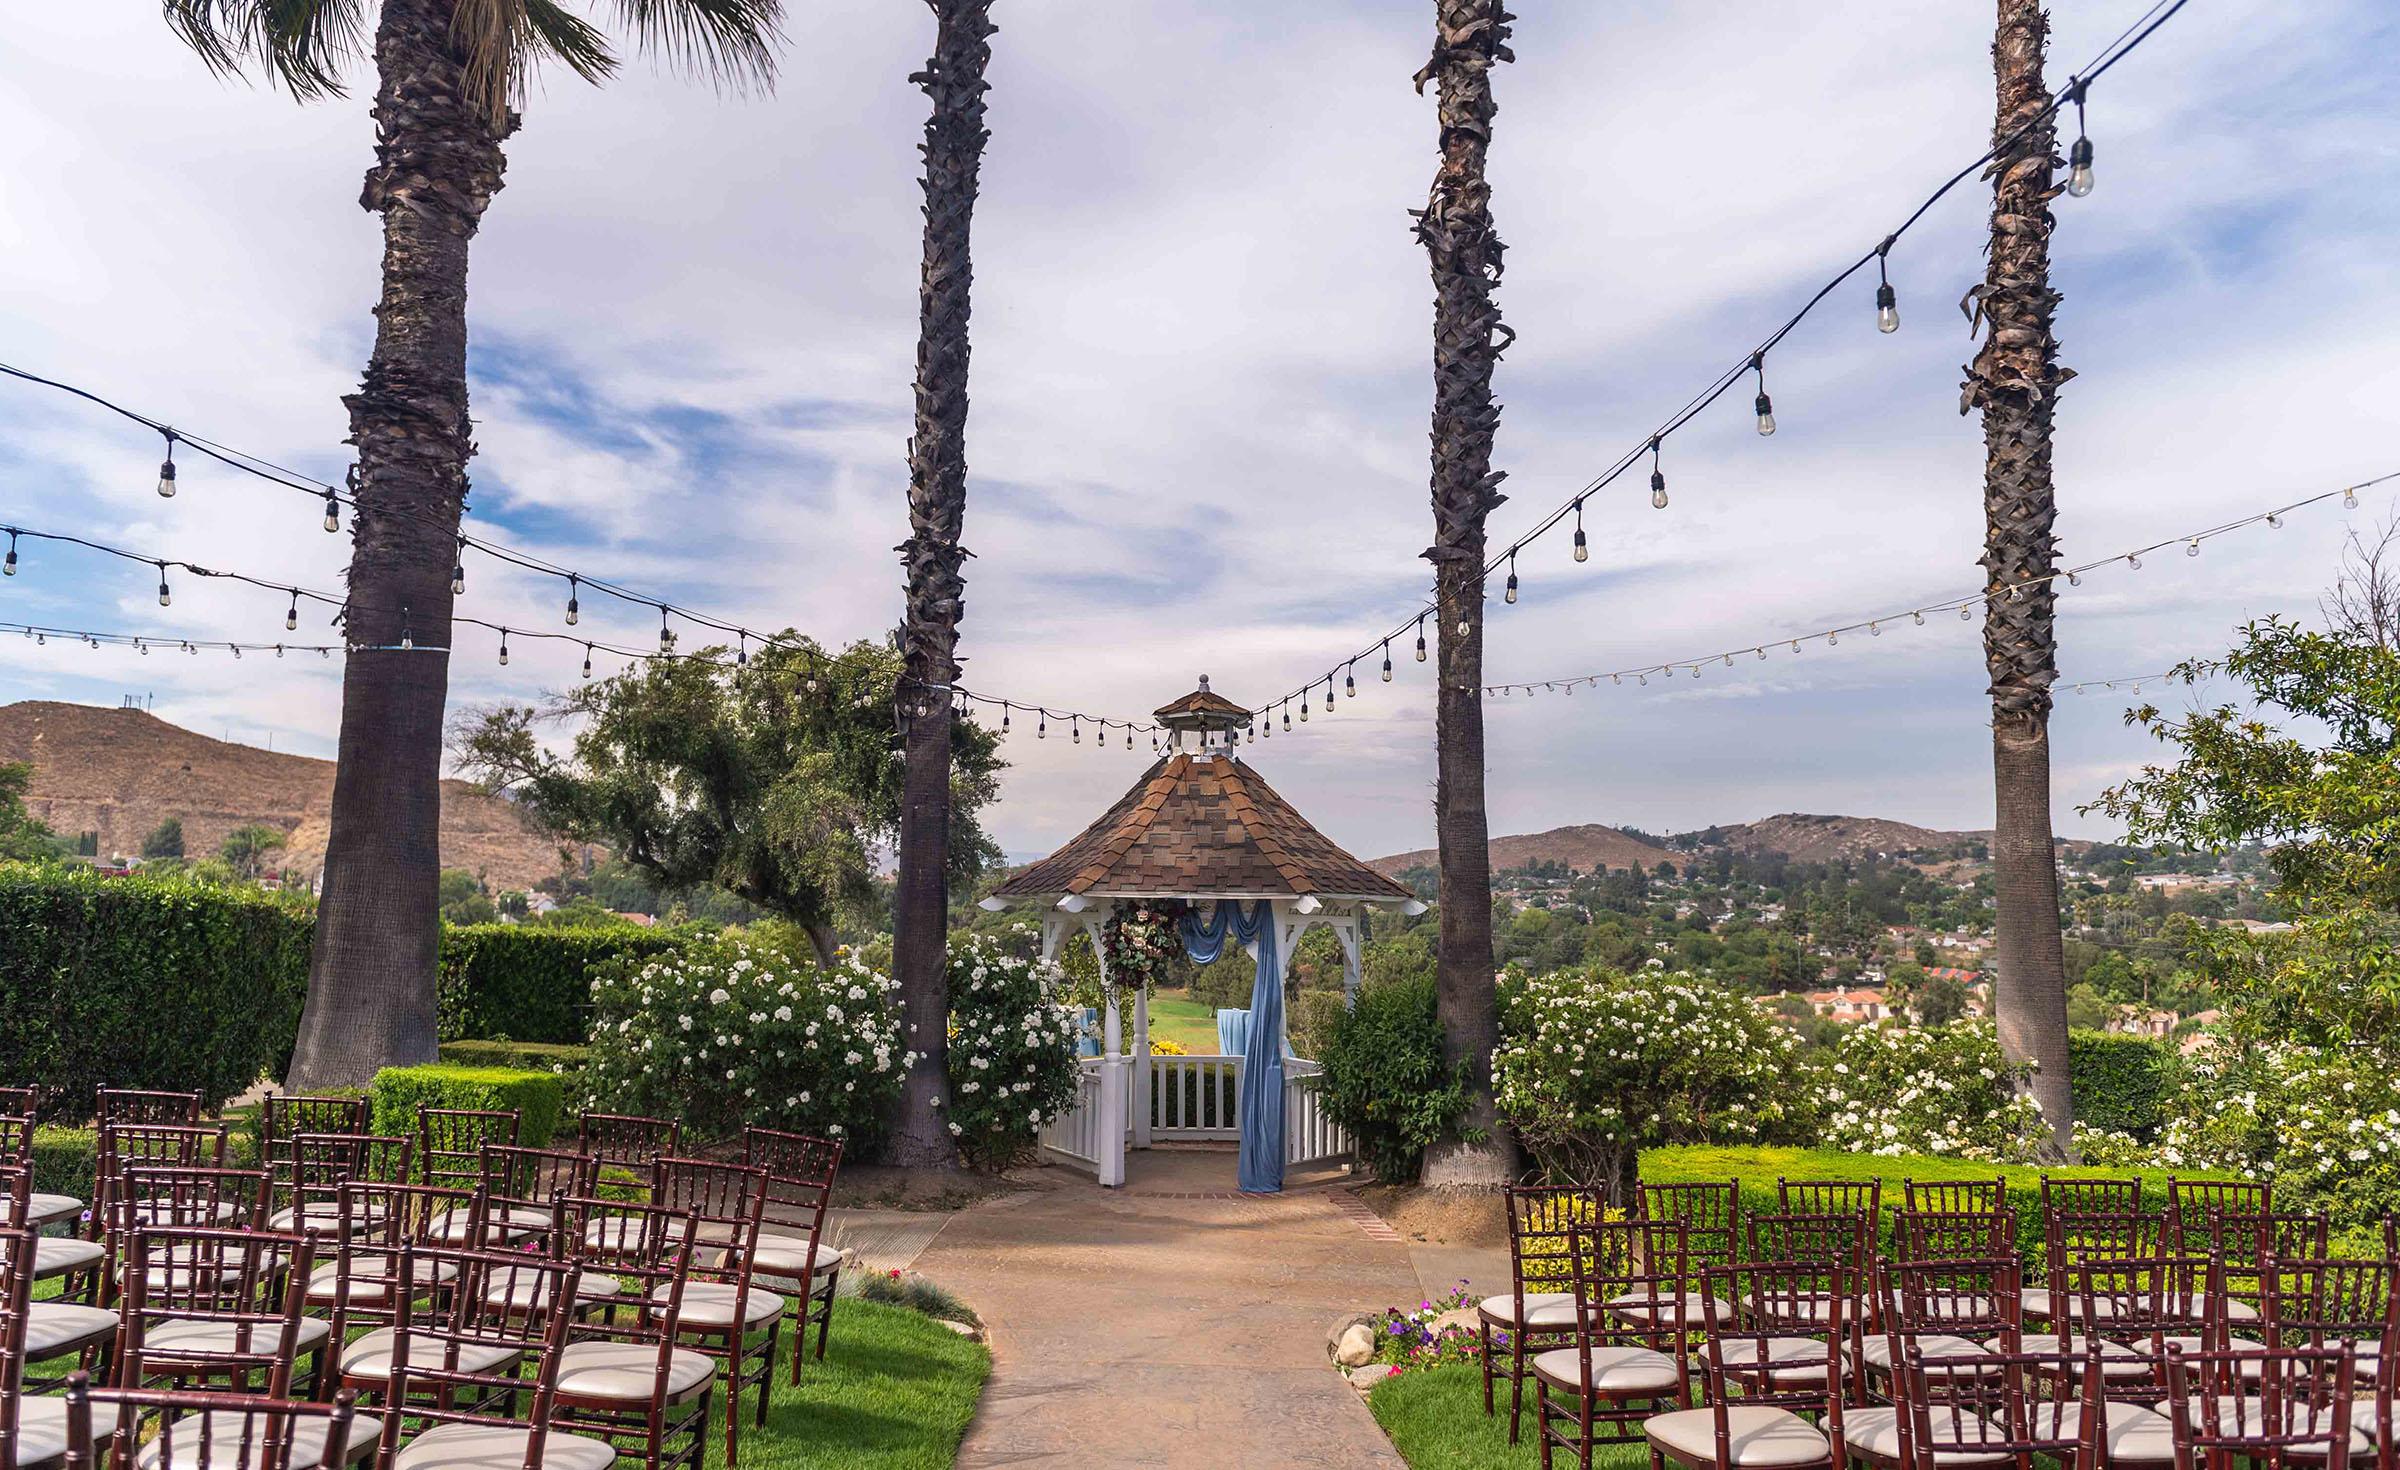 Birstro Lights Ceremony Site - Indian Hills - Riverside, California - Riverside County - Wedgewood Weddings